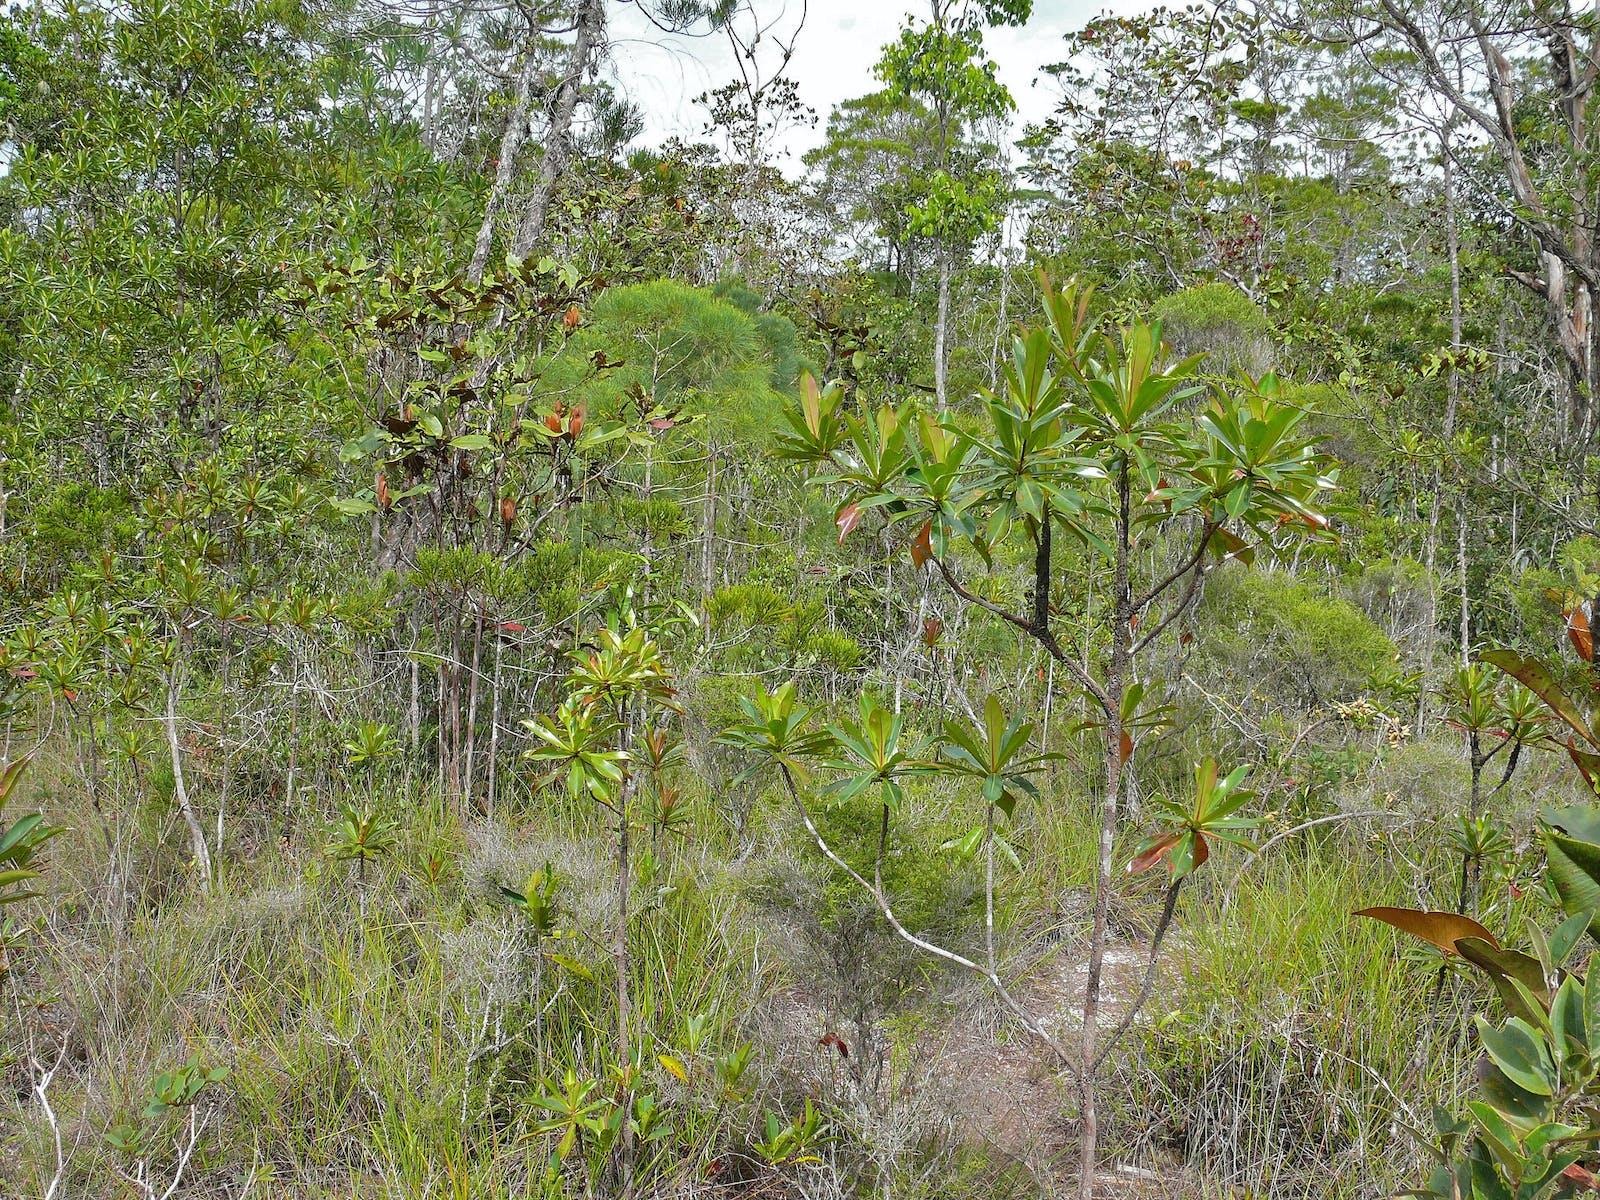 Sundaland Heath Forests